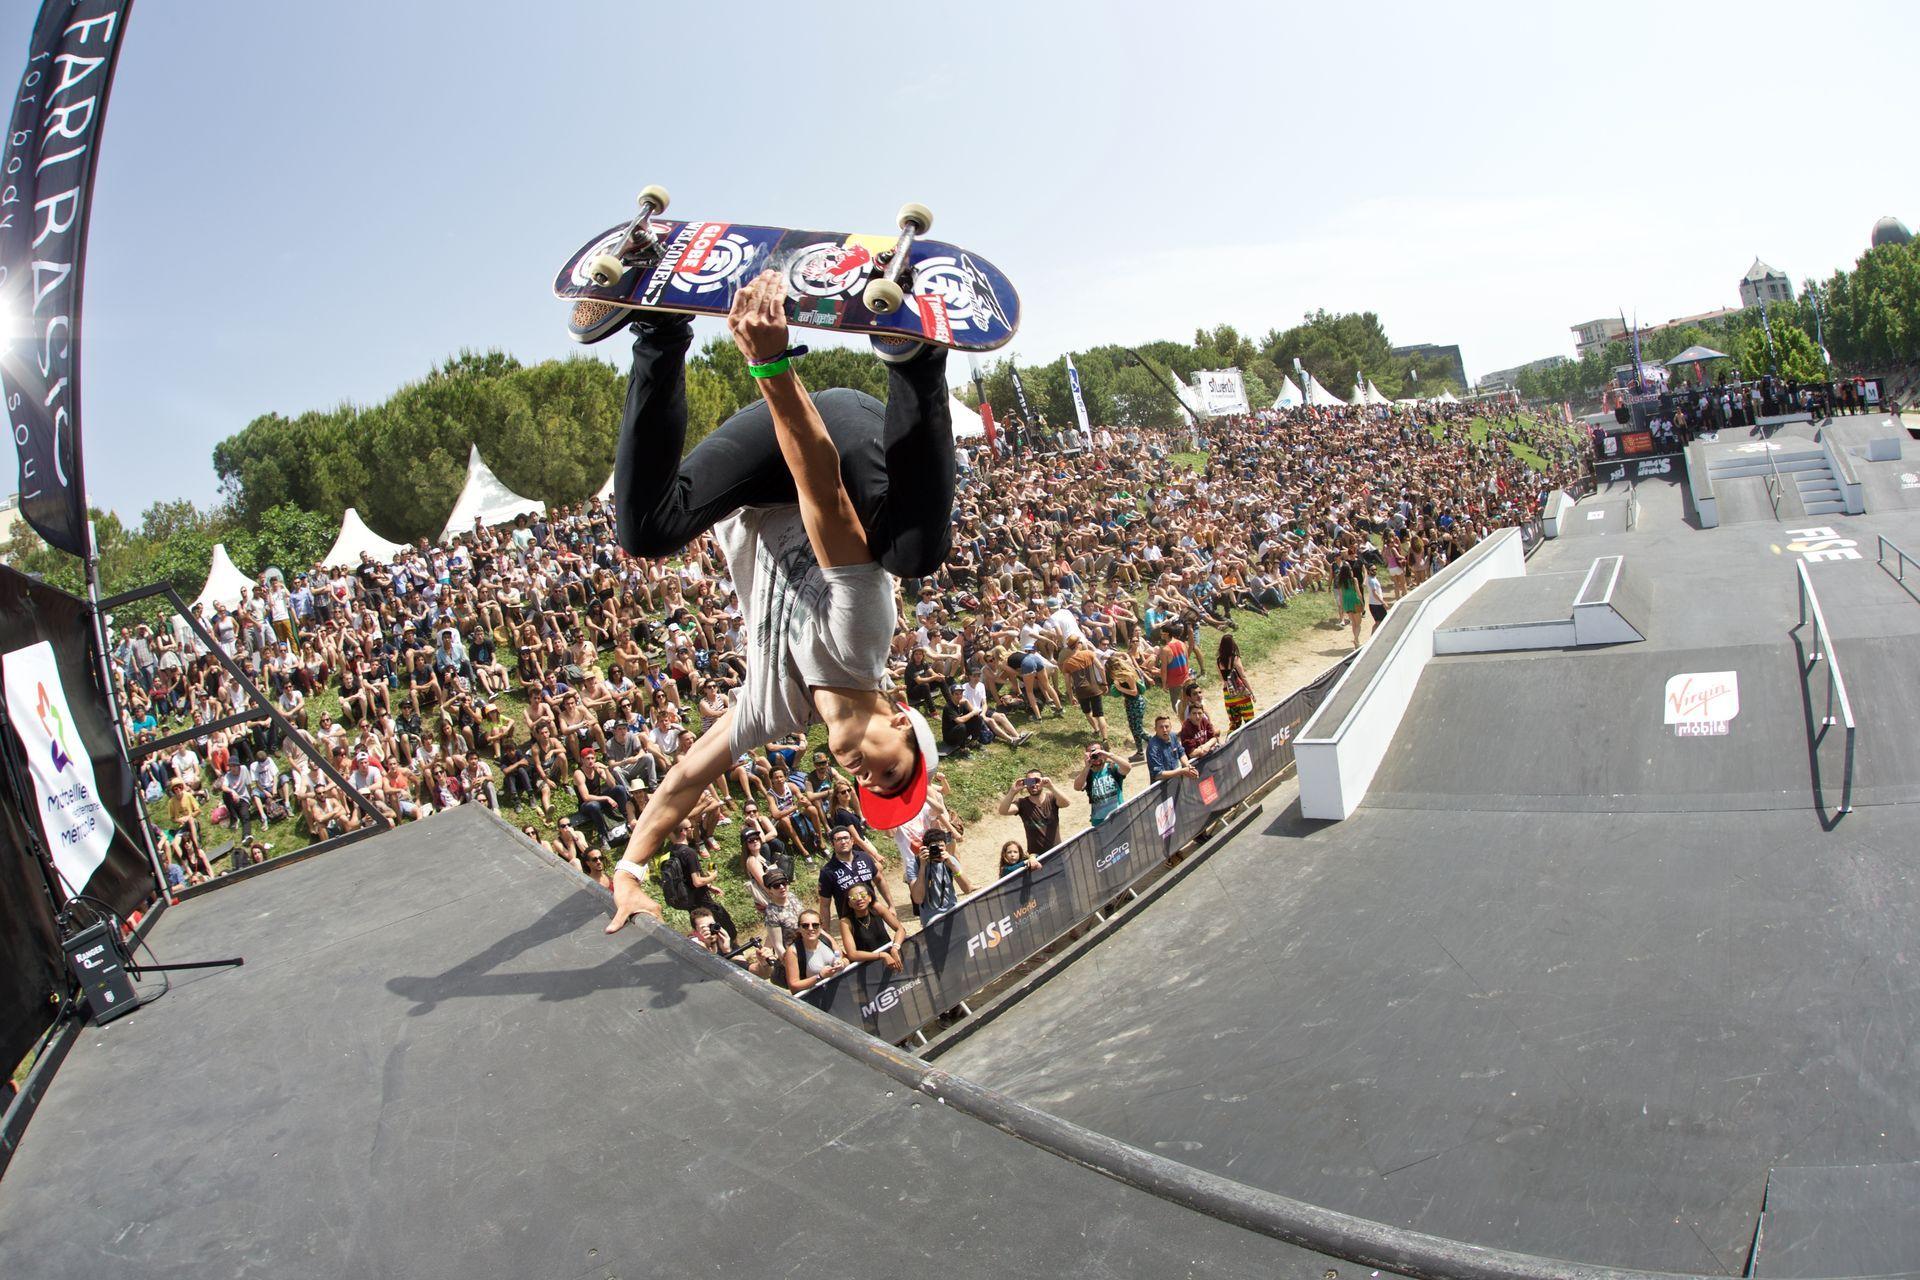 Skateboard au FISE © Cedric Derodot